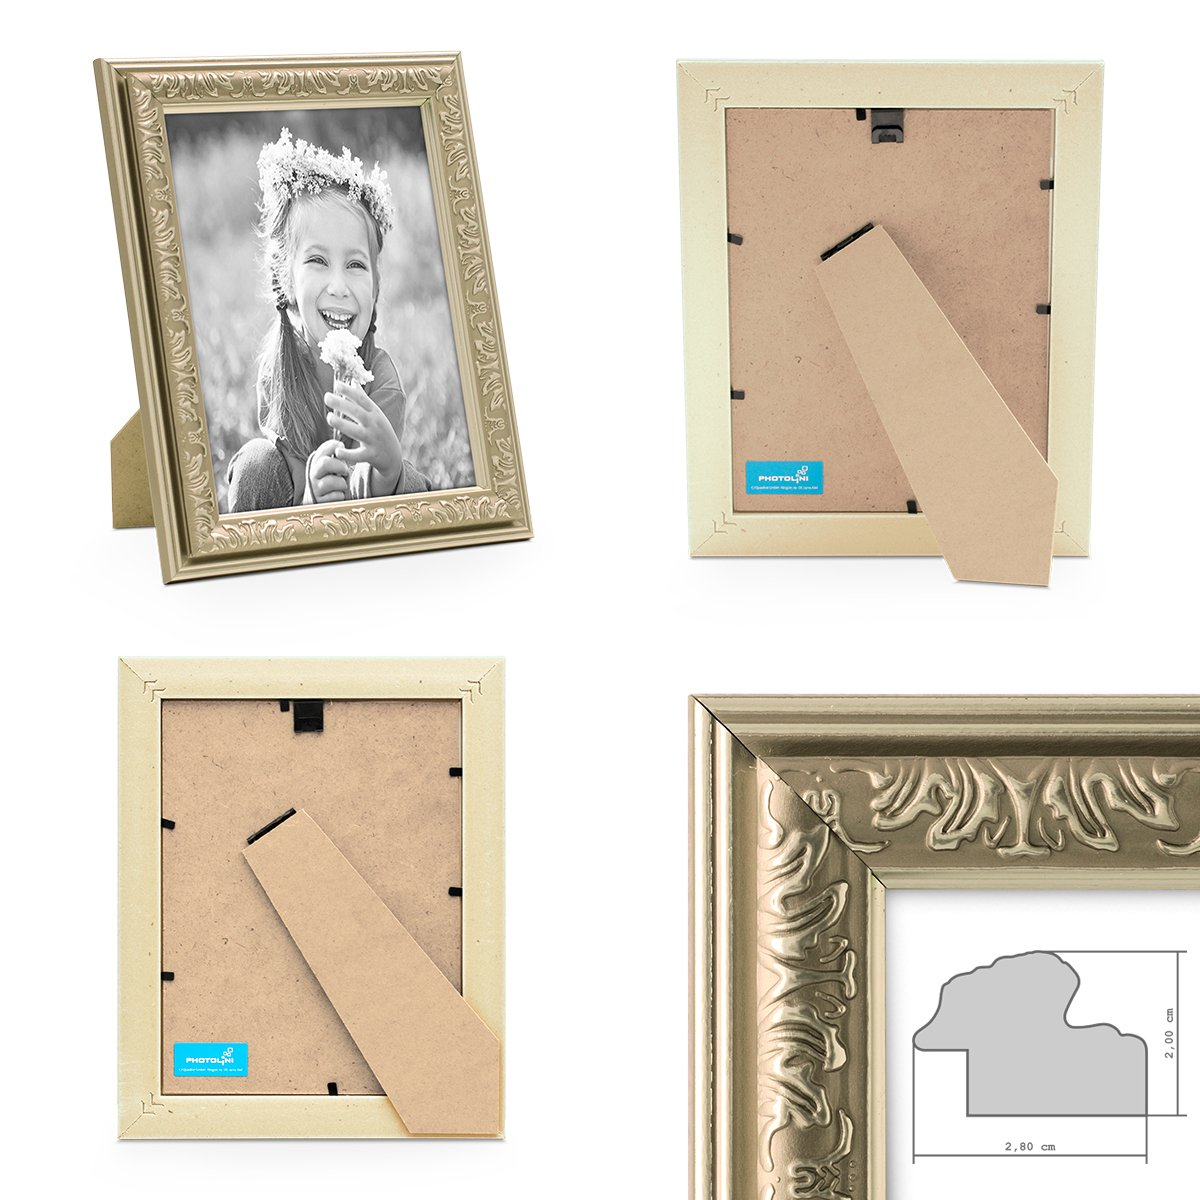 Amazon.de: PHOTOLINI Bilderrahmen Antik Silber Nostalgie 21x30 cm ...